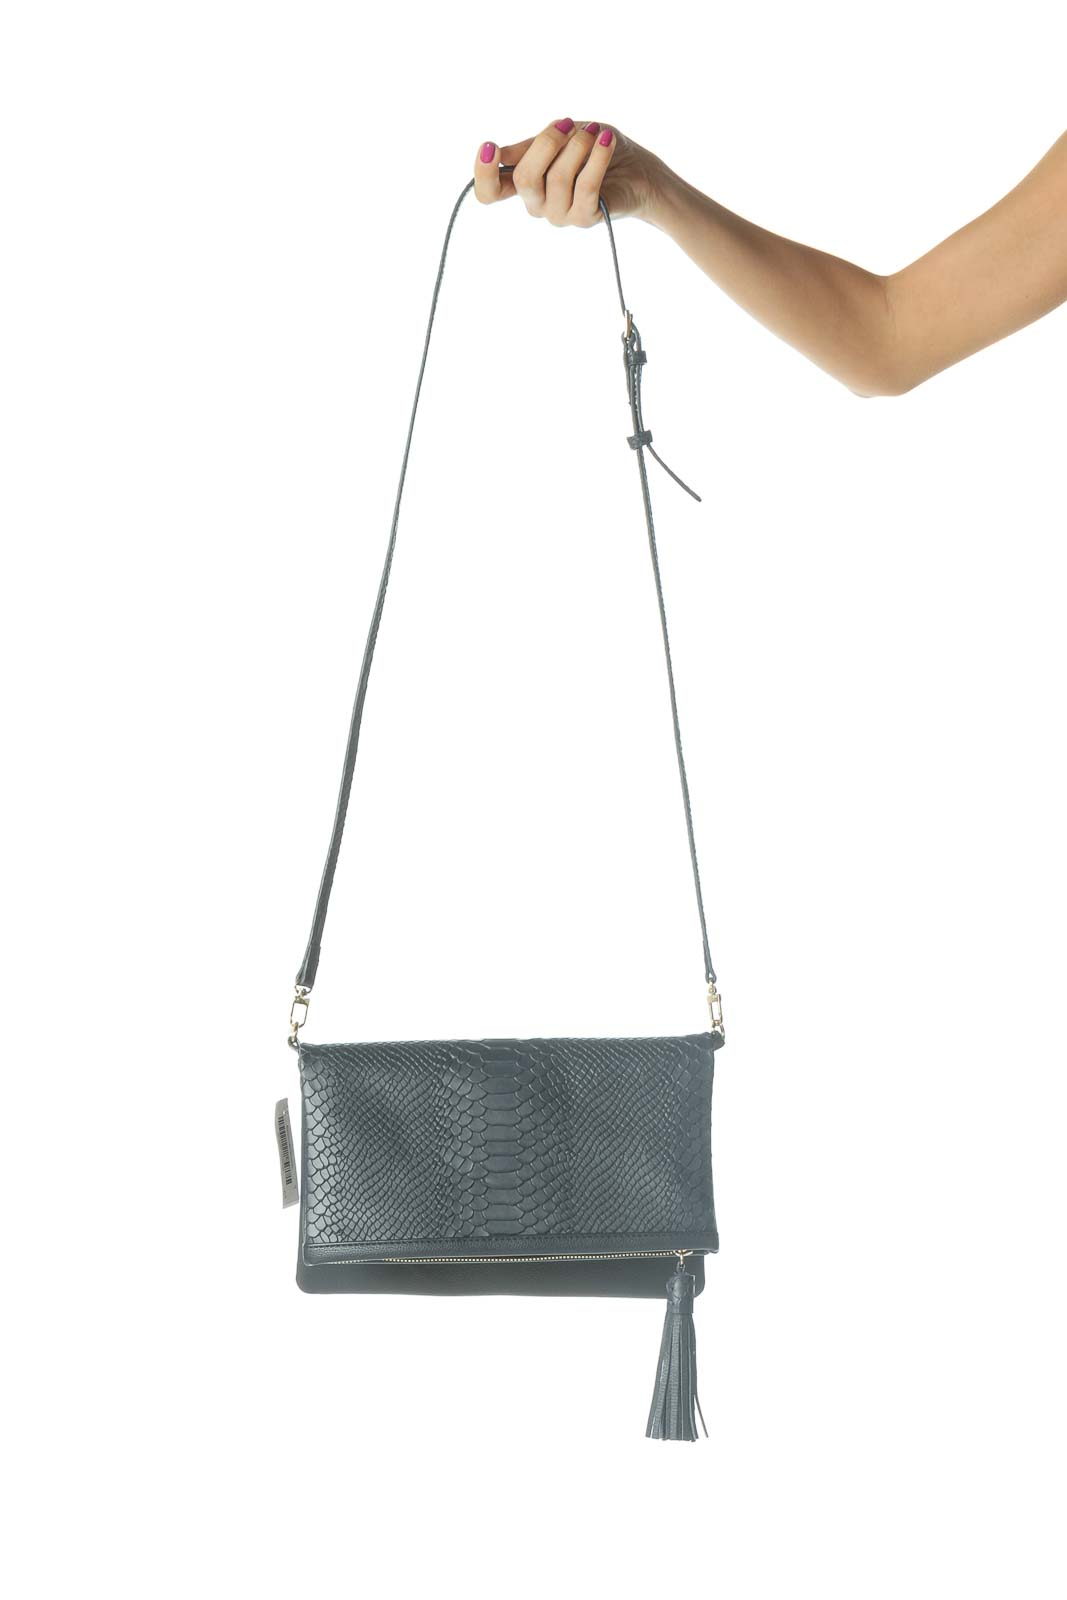 Blue Clutch Bag Front